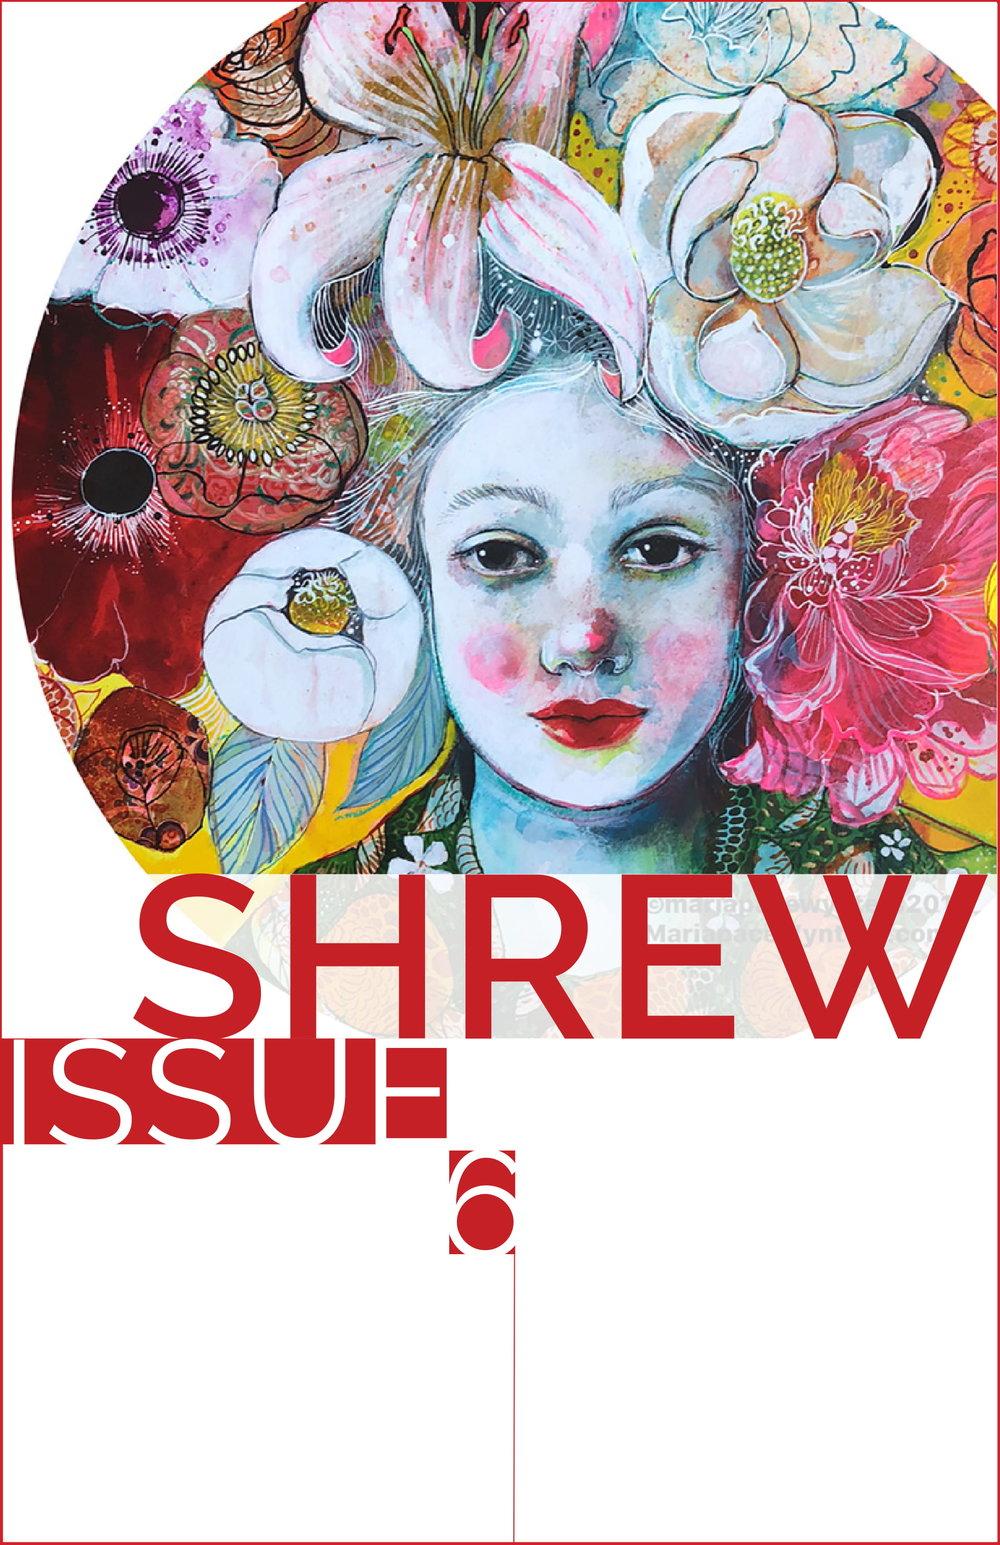 Shrew Issue 6.2-01.jpg